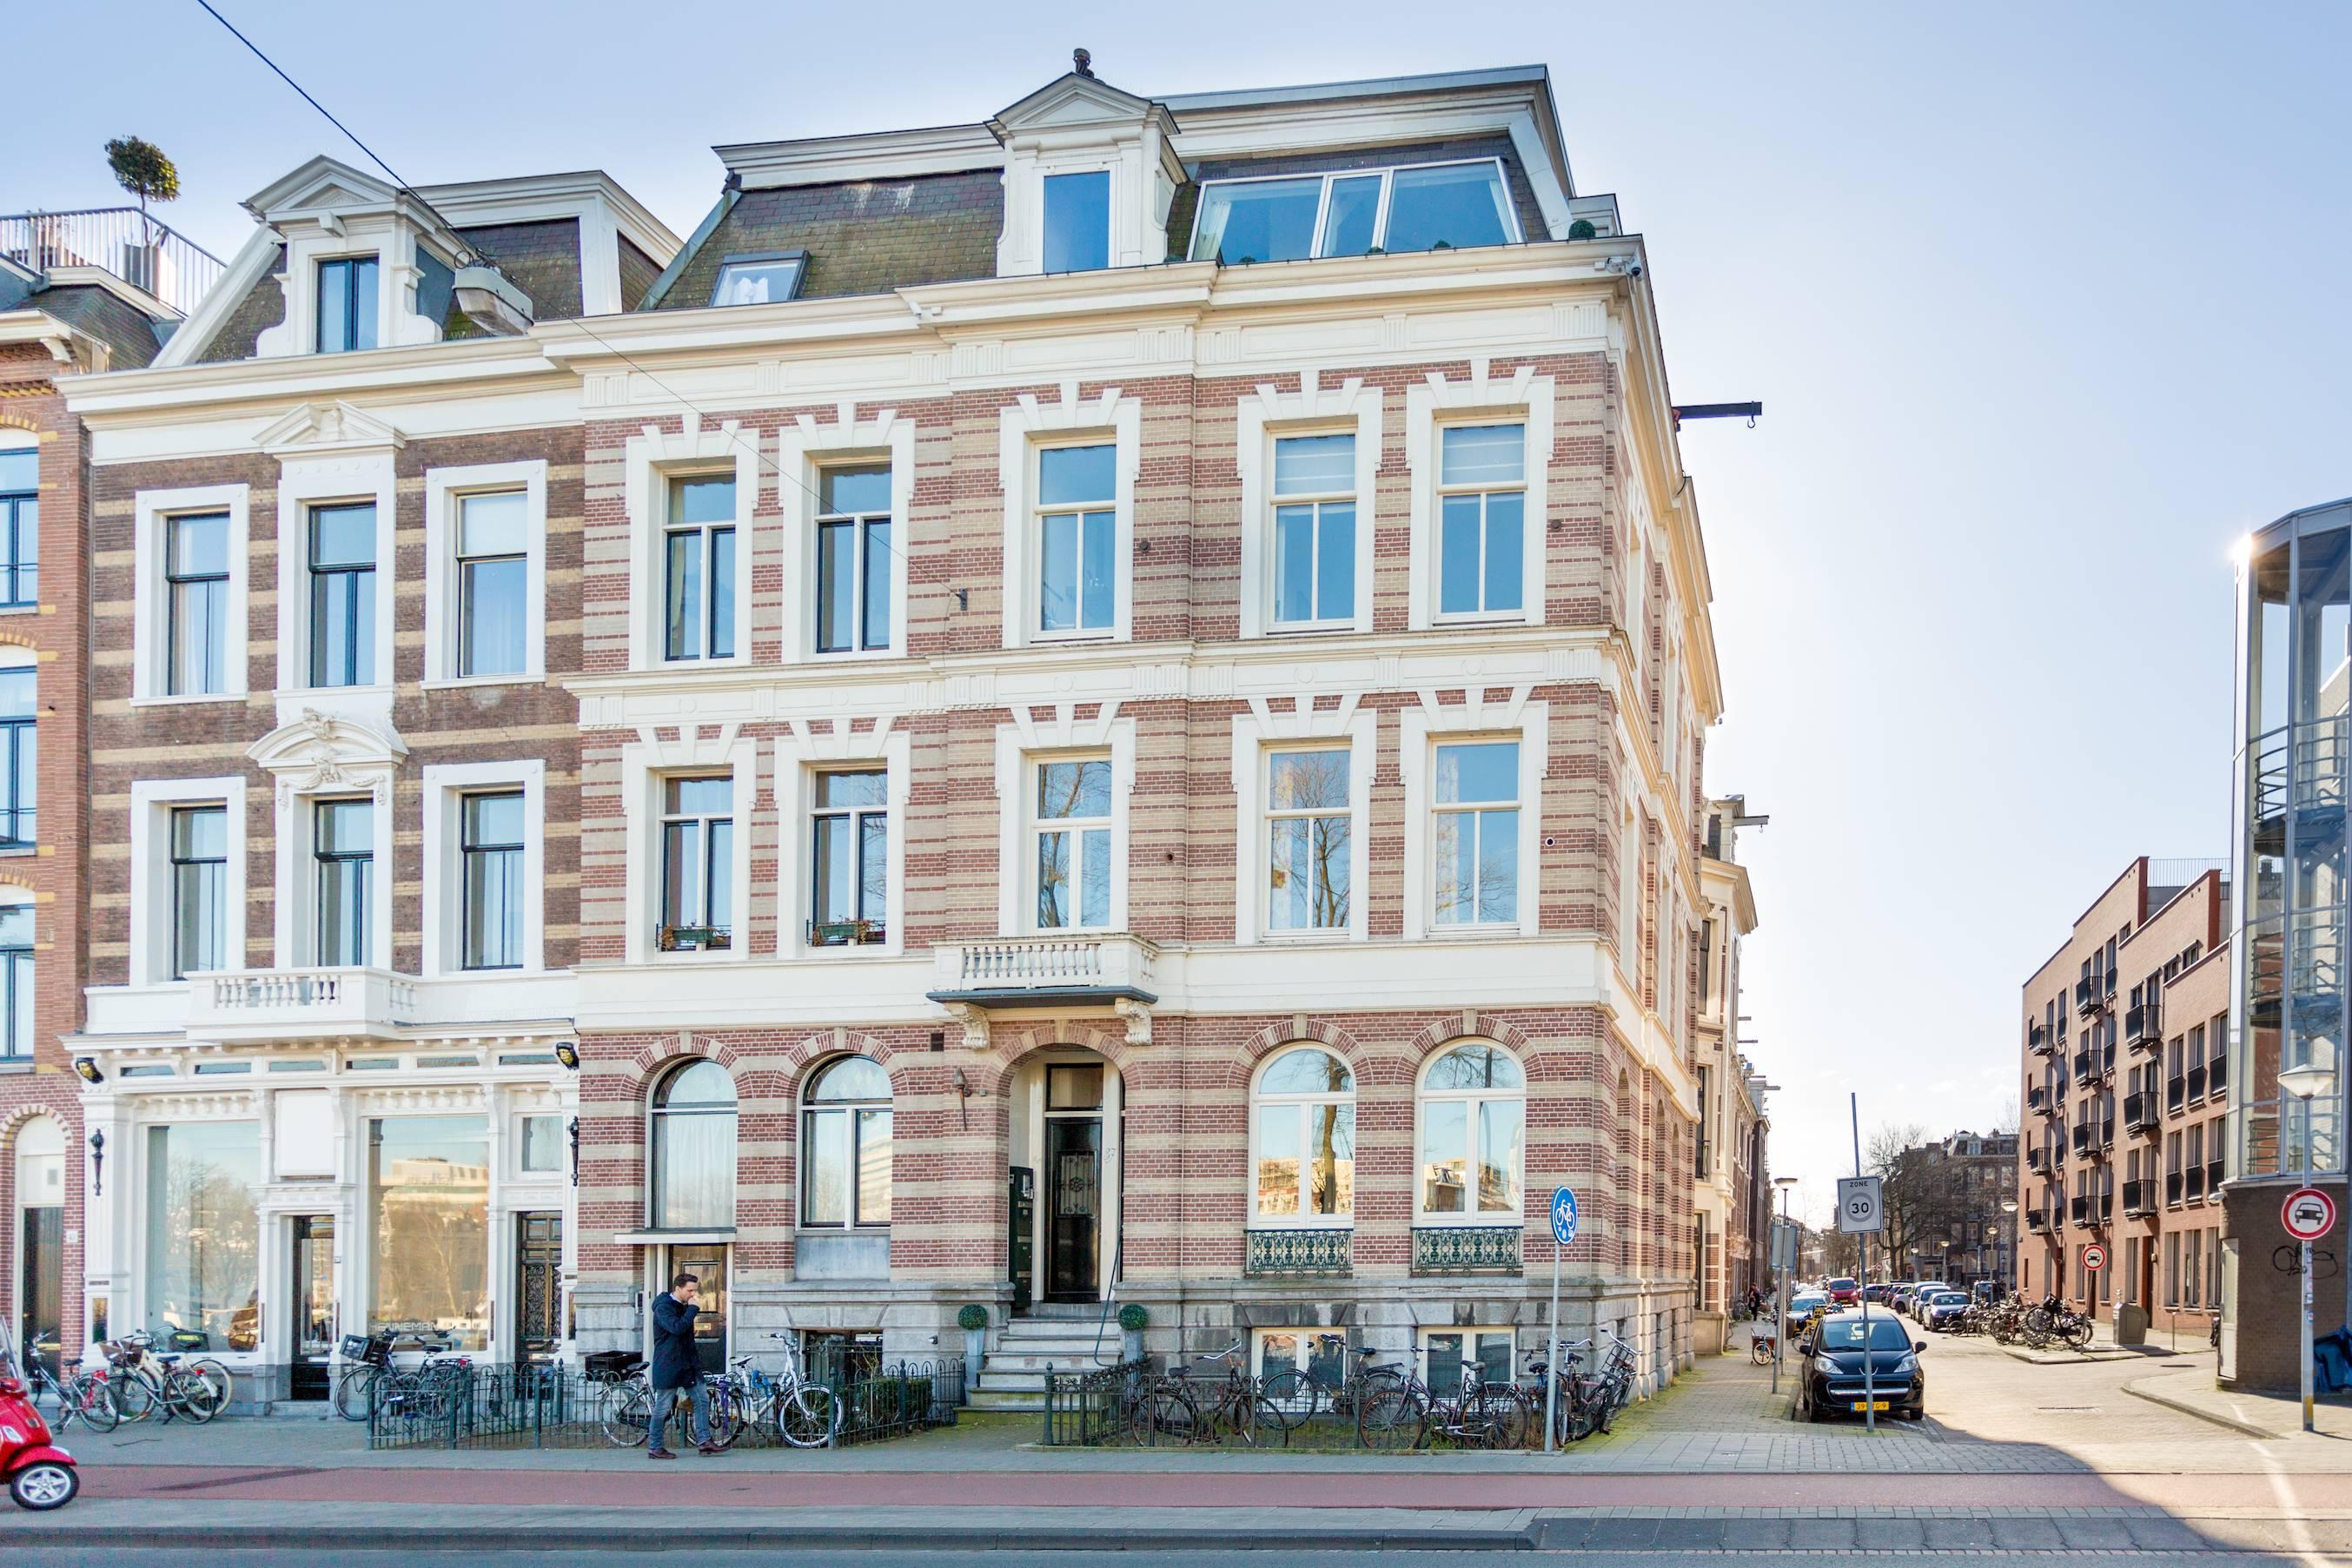 Amsteldijk / Amsterdam